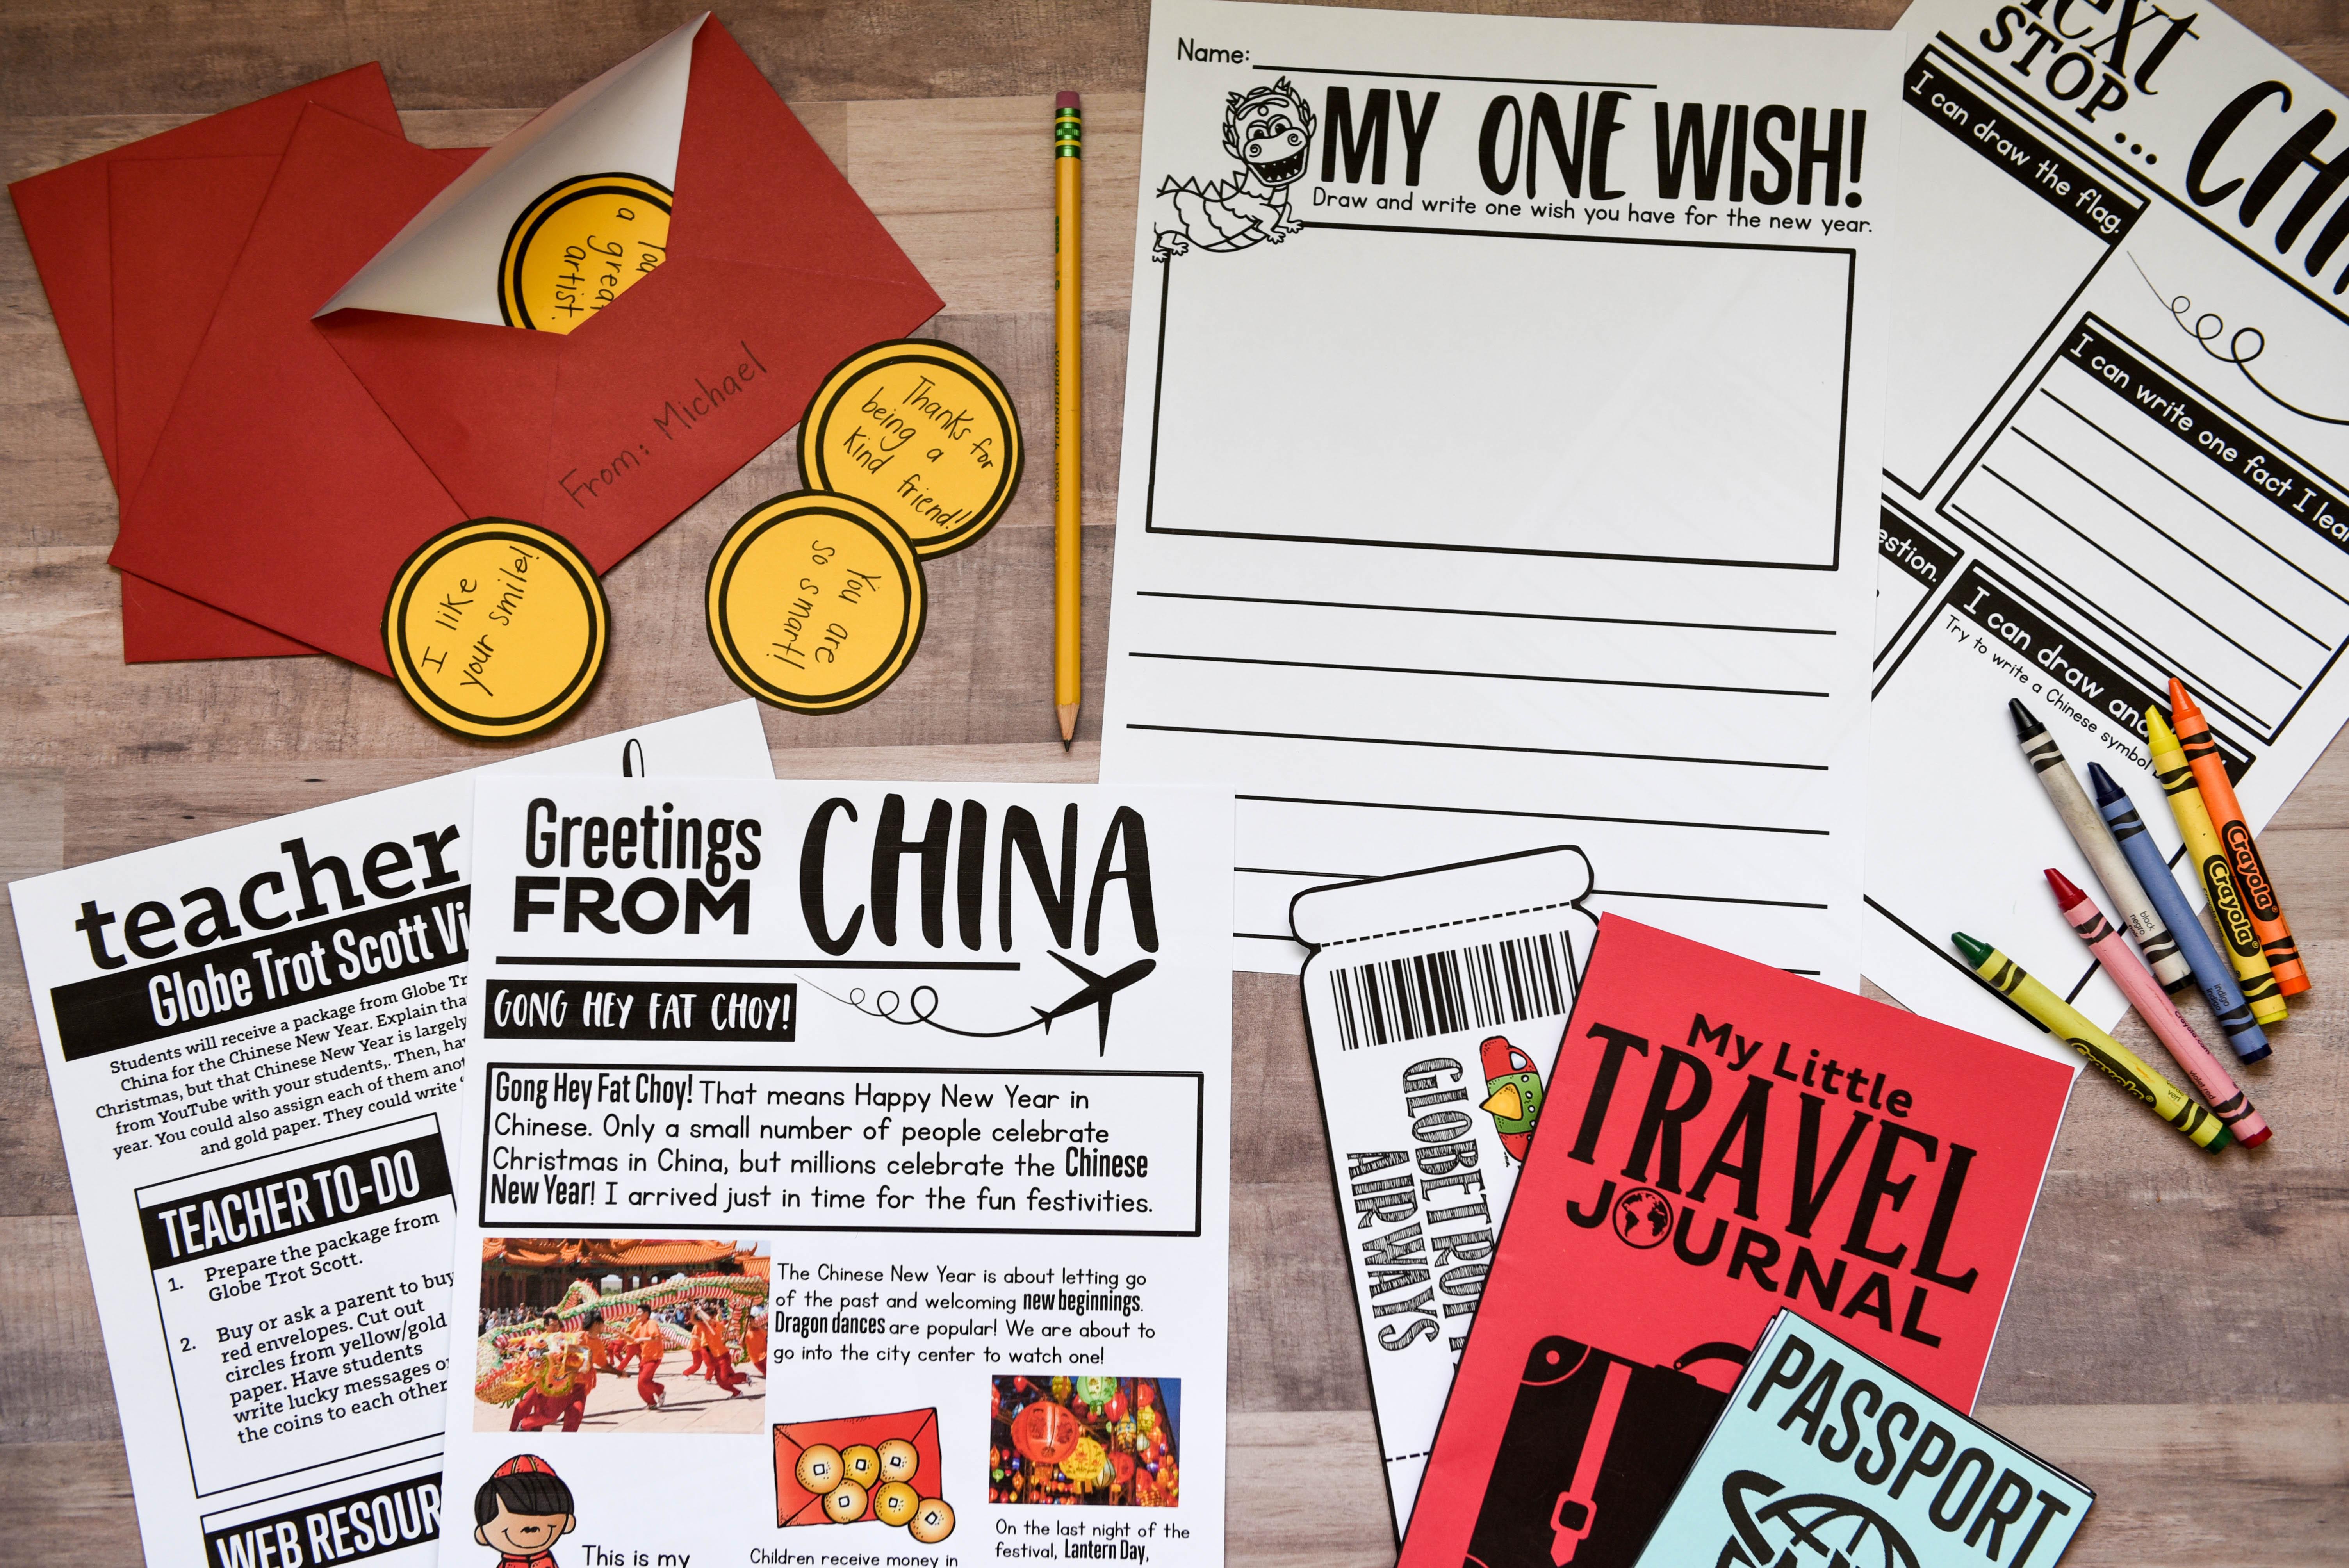 Holidays Around the World (Free Download) – Lyndsey Kuster